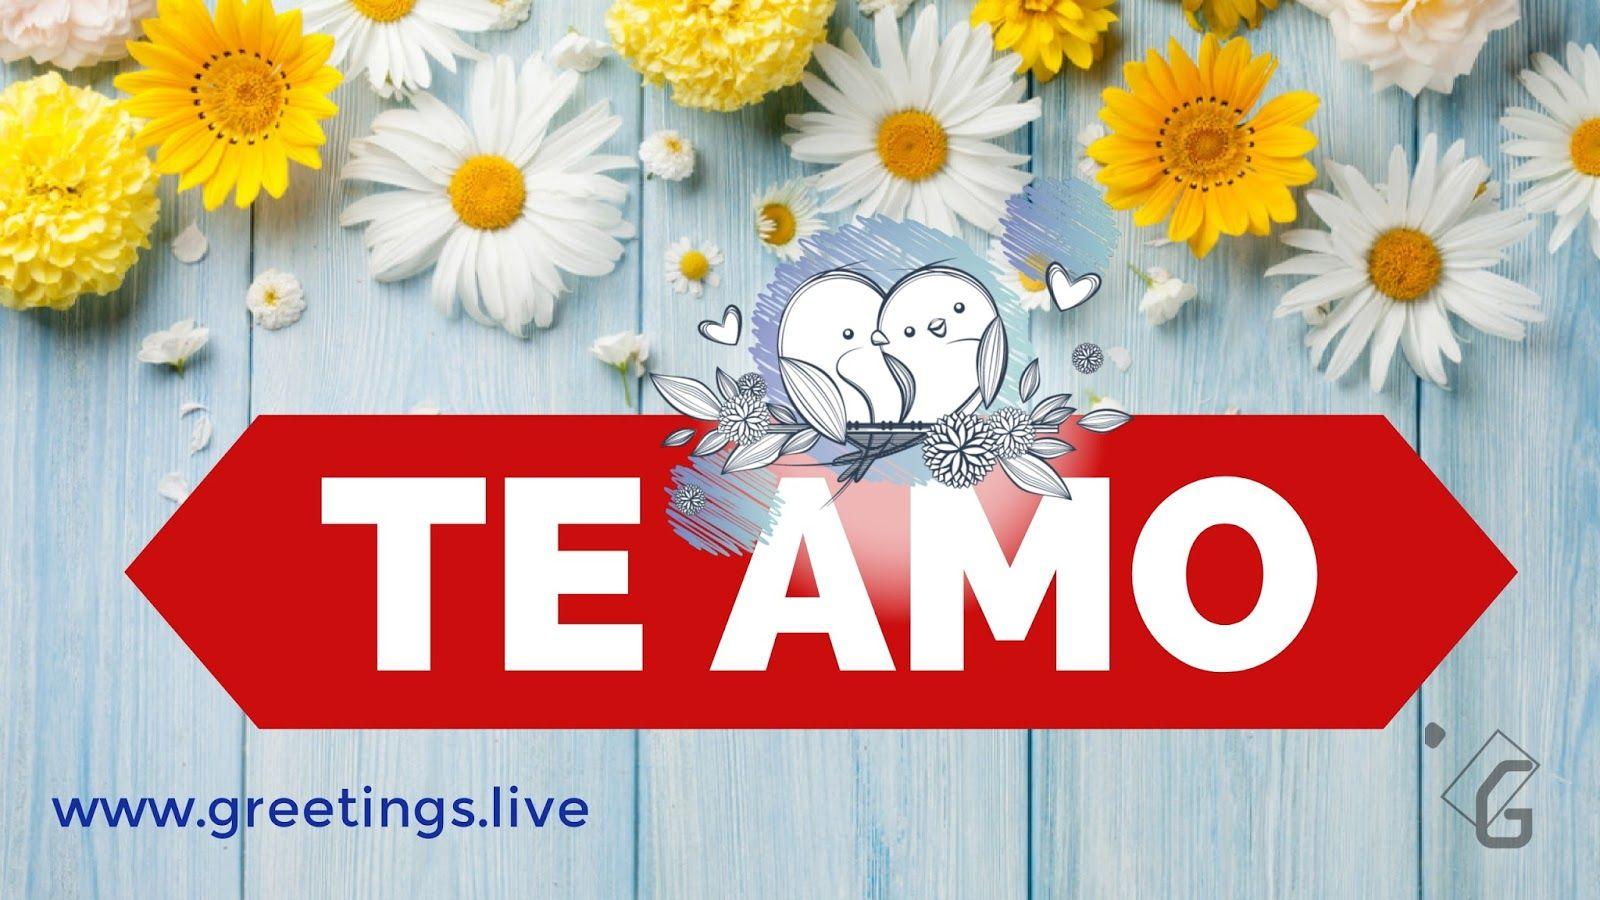 Love greetings in spanish spanish te amo means i love you in love greetings in spanish spanish te amo means i love you in kristyandbryce Gallery